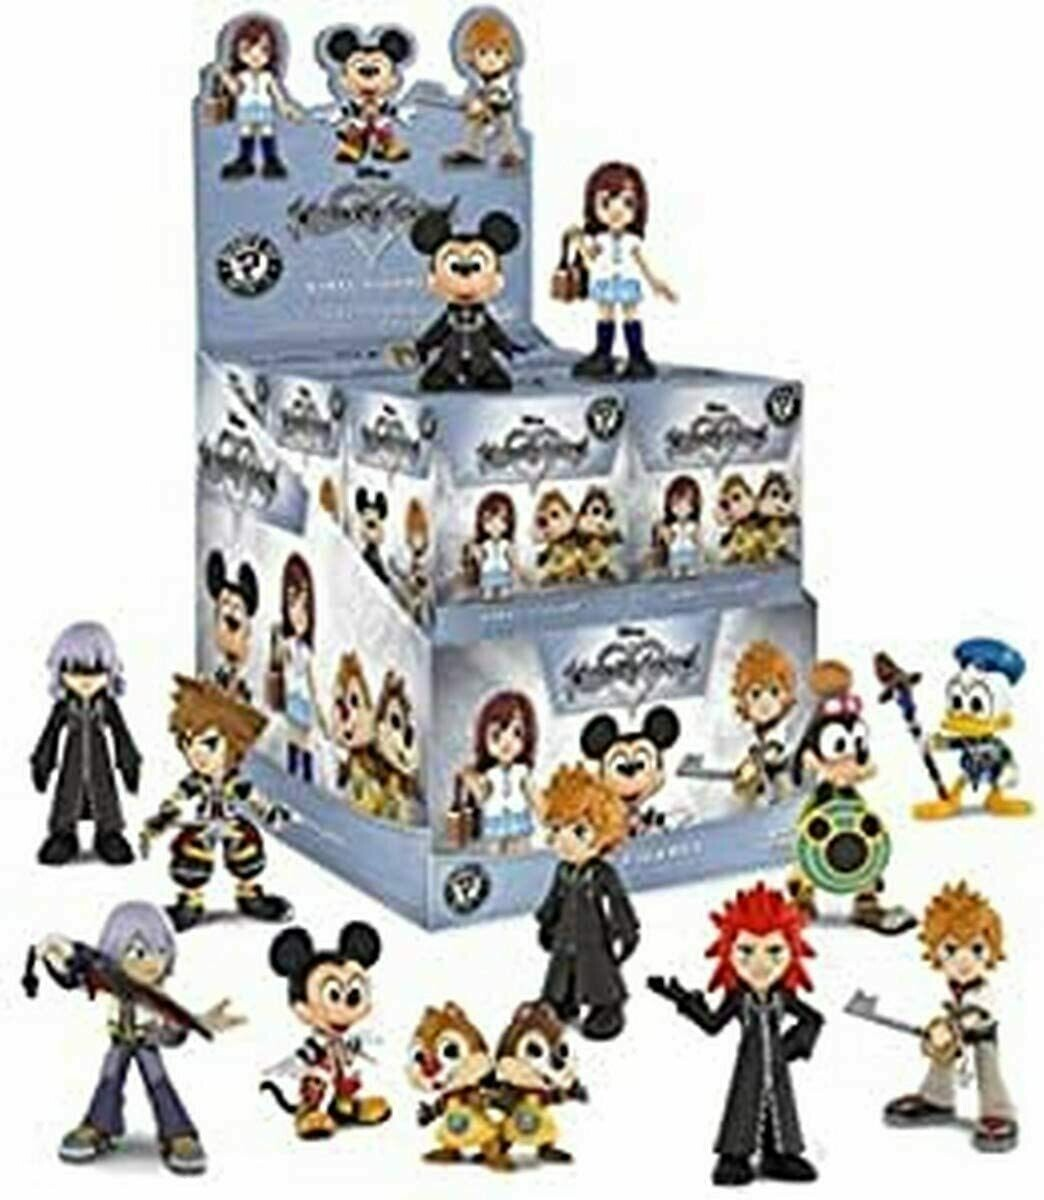 Kingdom Hearts Blind Box